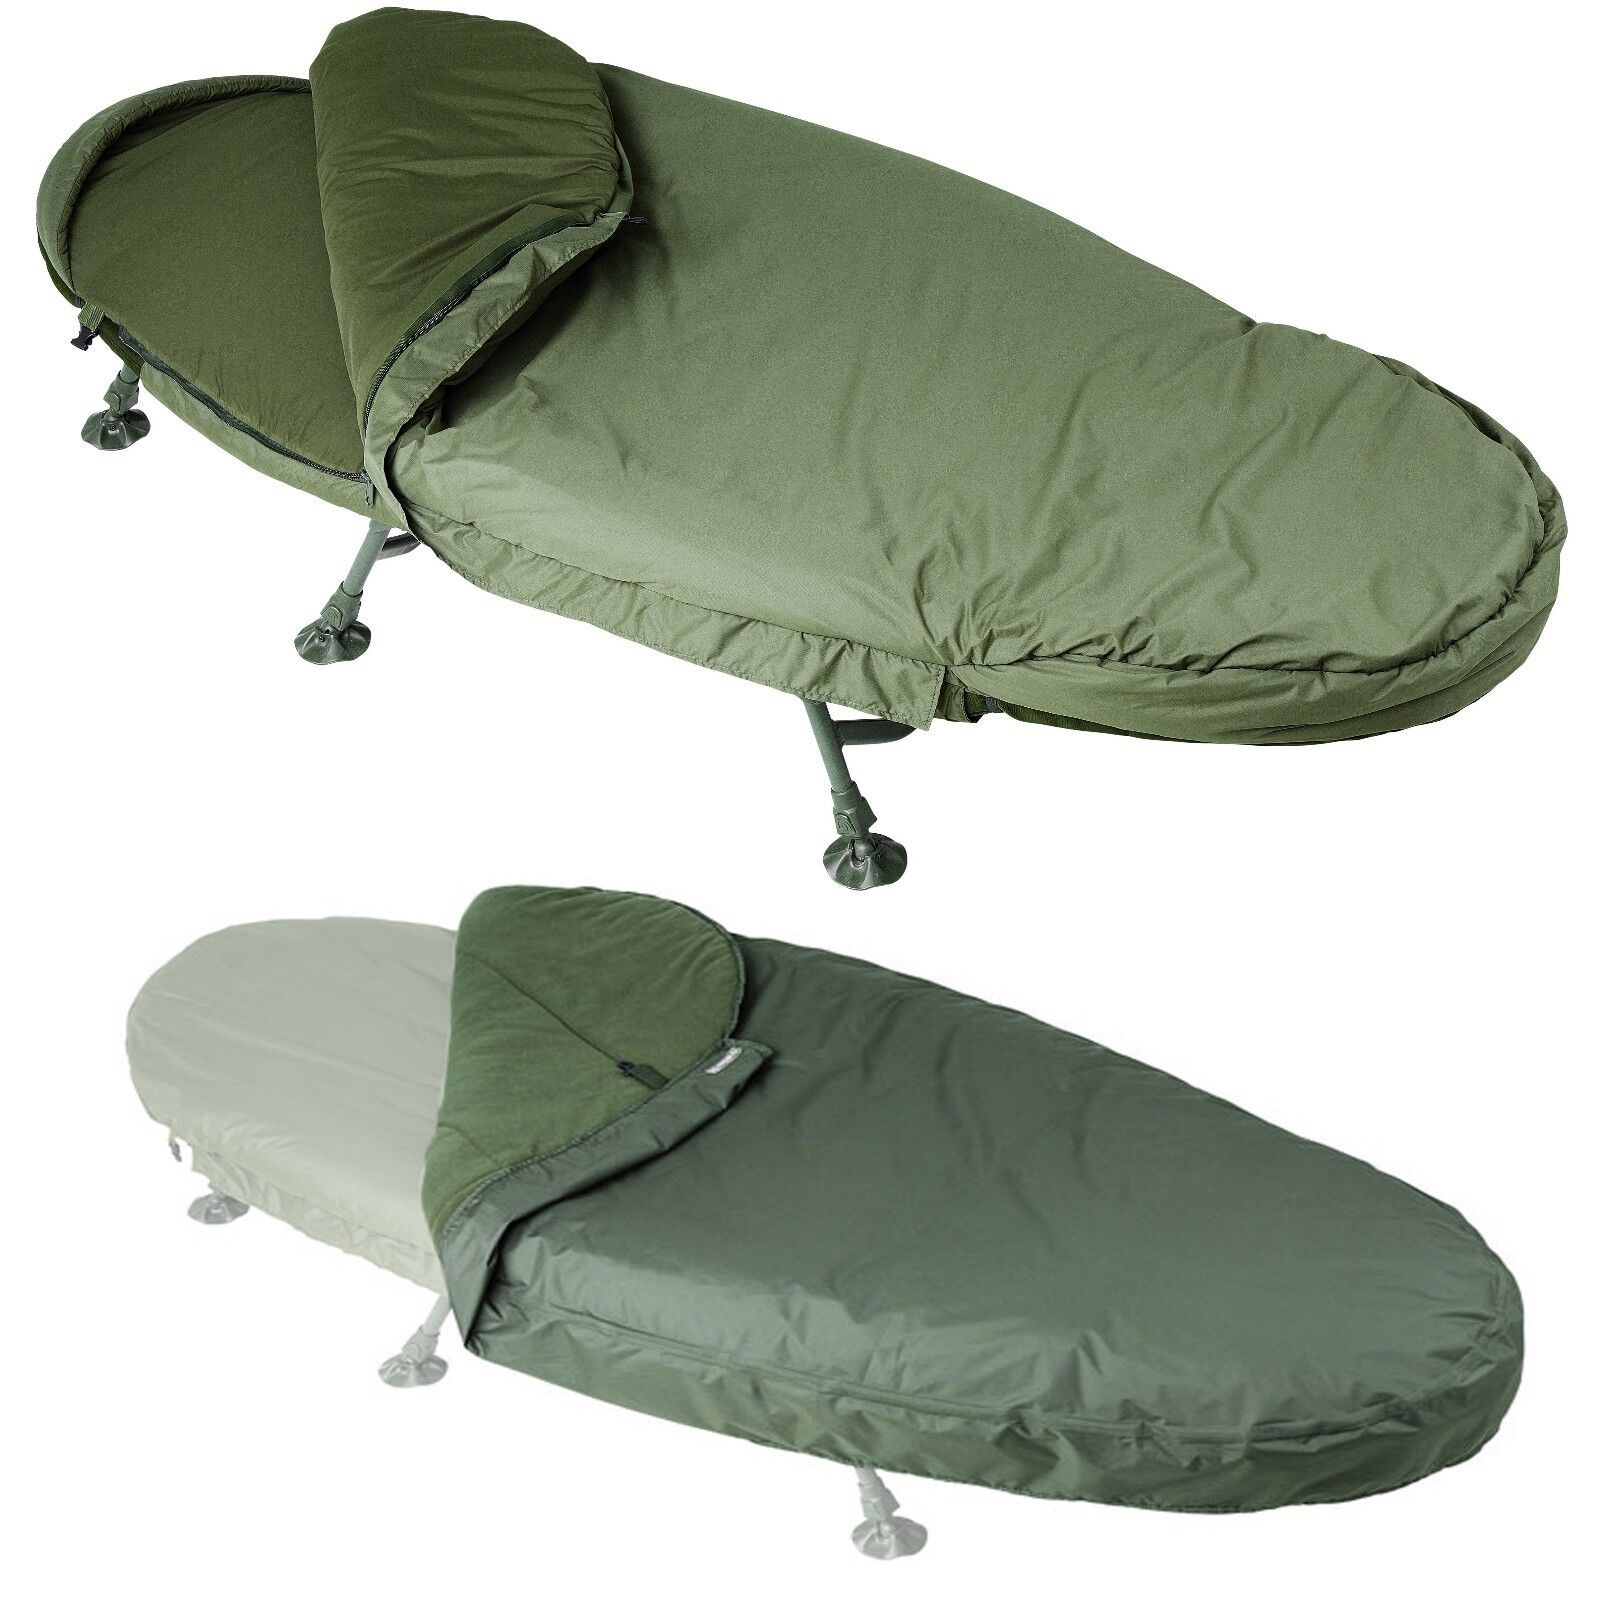 Trakker Levelite Oval Complete Bed & Bag System Fishing Bedchair + Cover